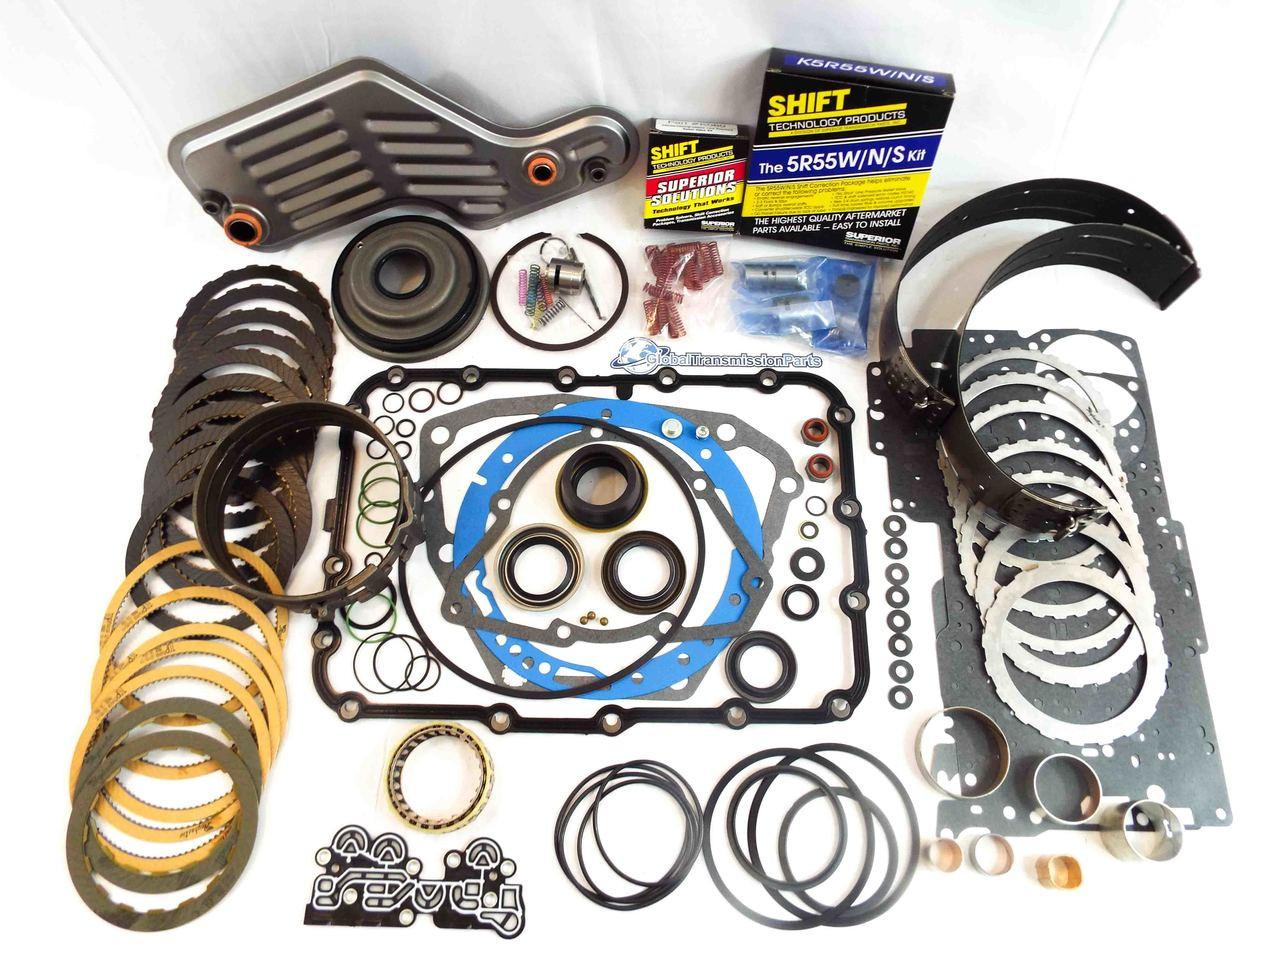 b7c3d3c962c 5R55S 5R55W Transmission Super Master Rebuild Kit. Price   595.00. Image 1.  Larger   More Photos